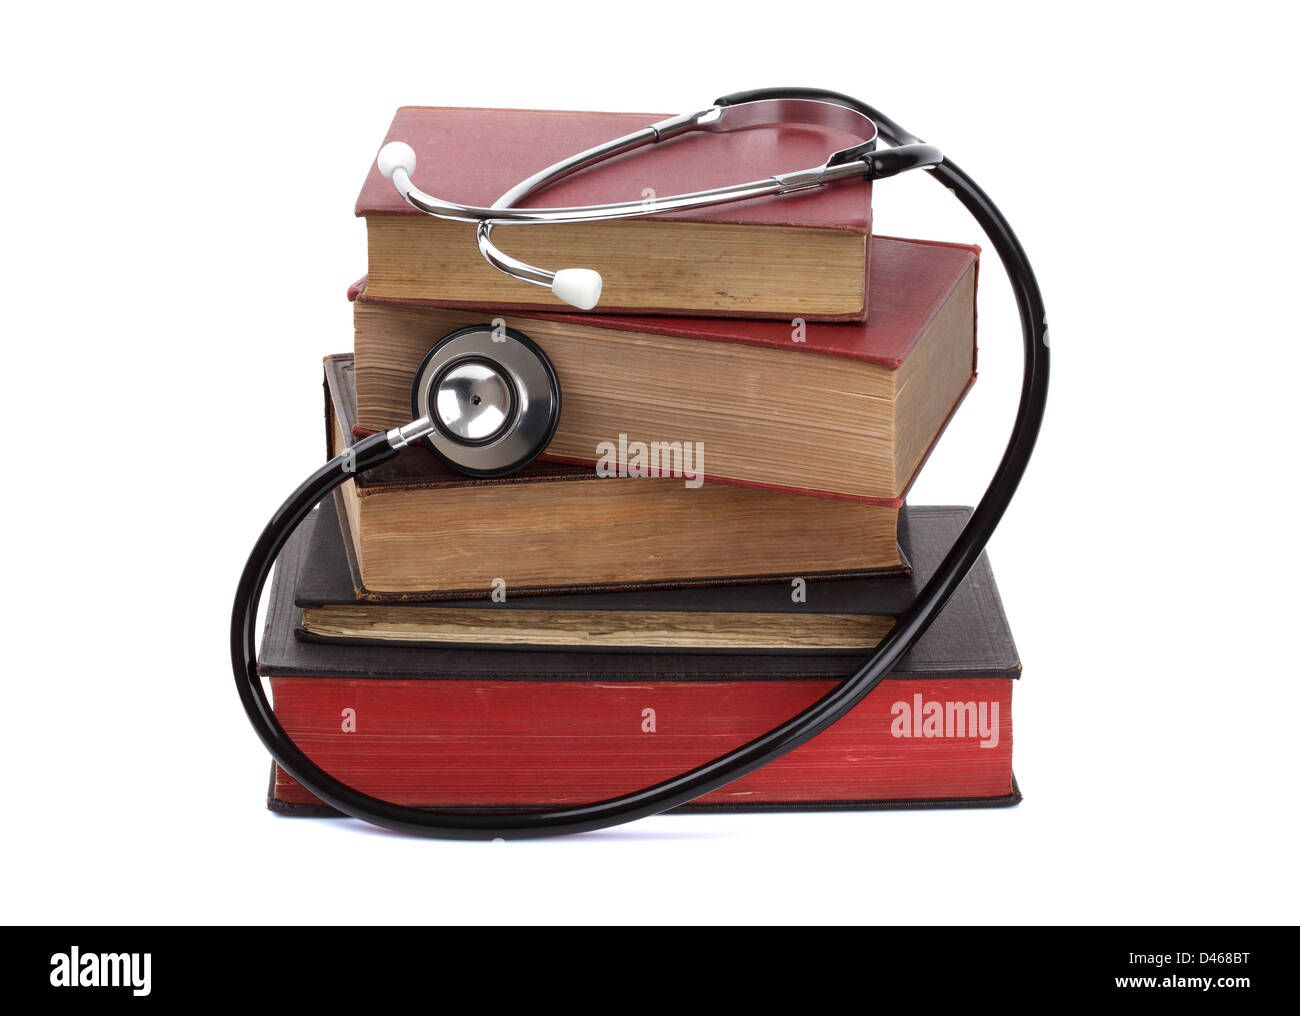 Health care and medicine - Stock Image